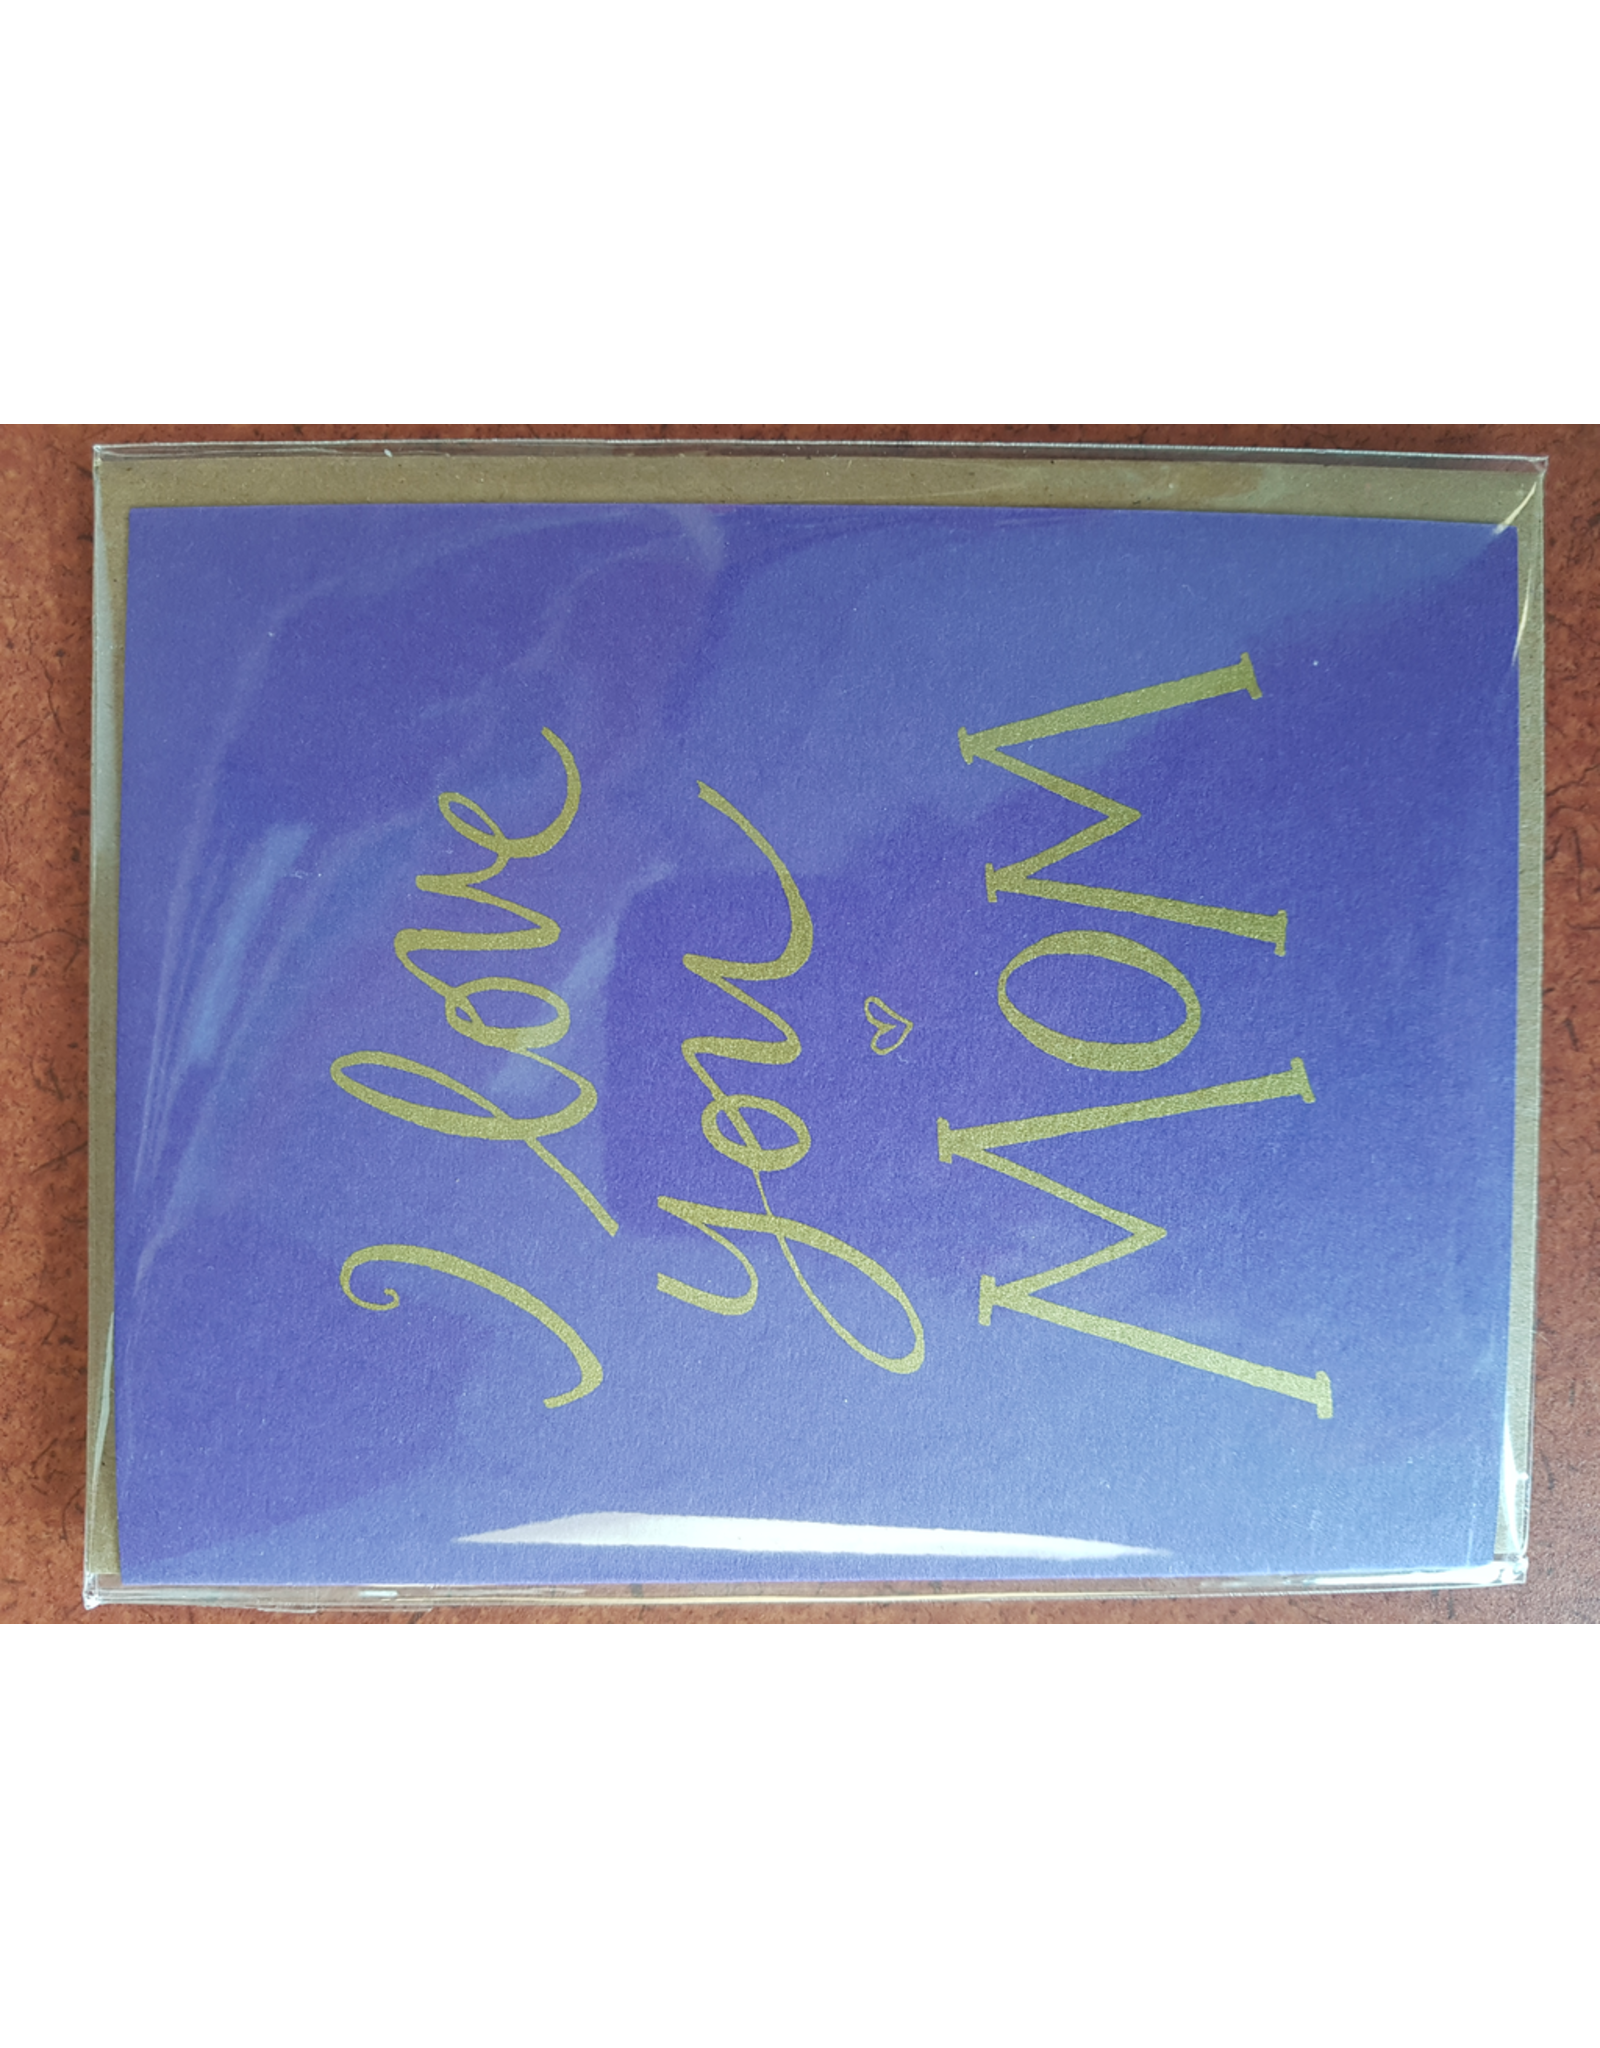 Karen Fuhr I love you MOM card